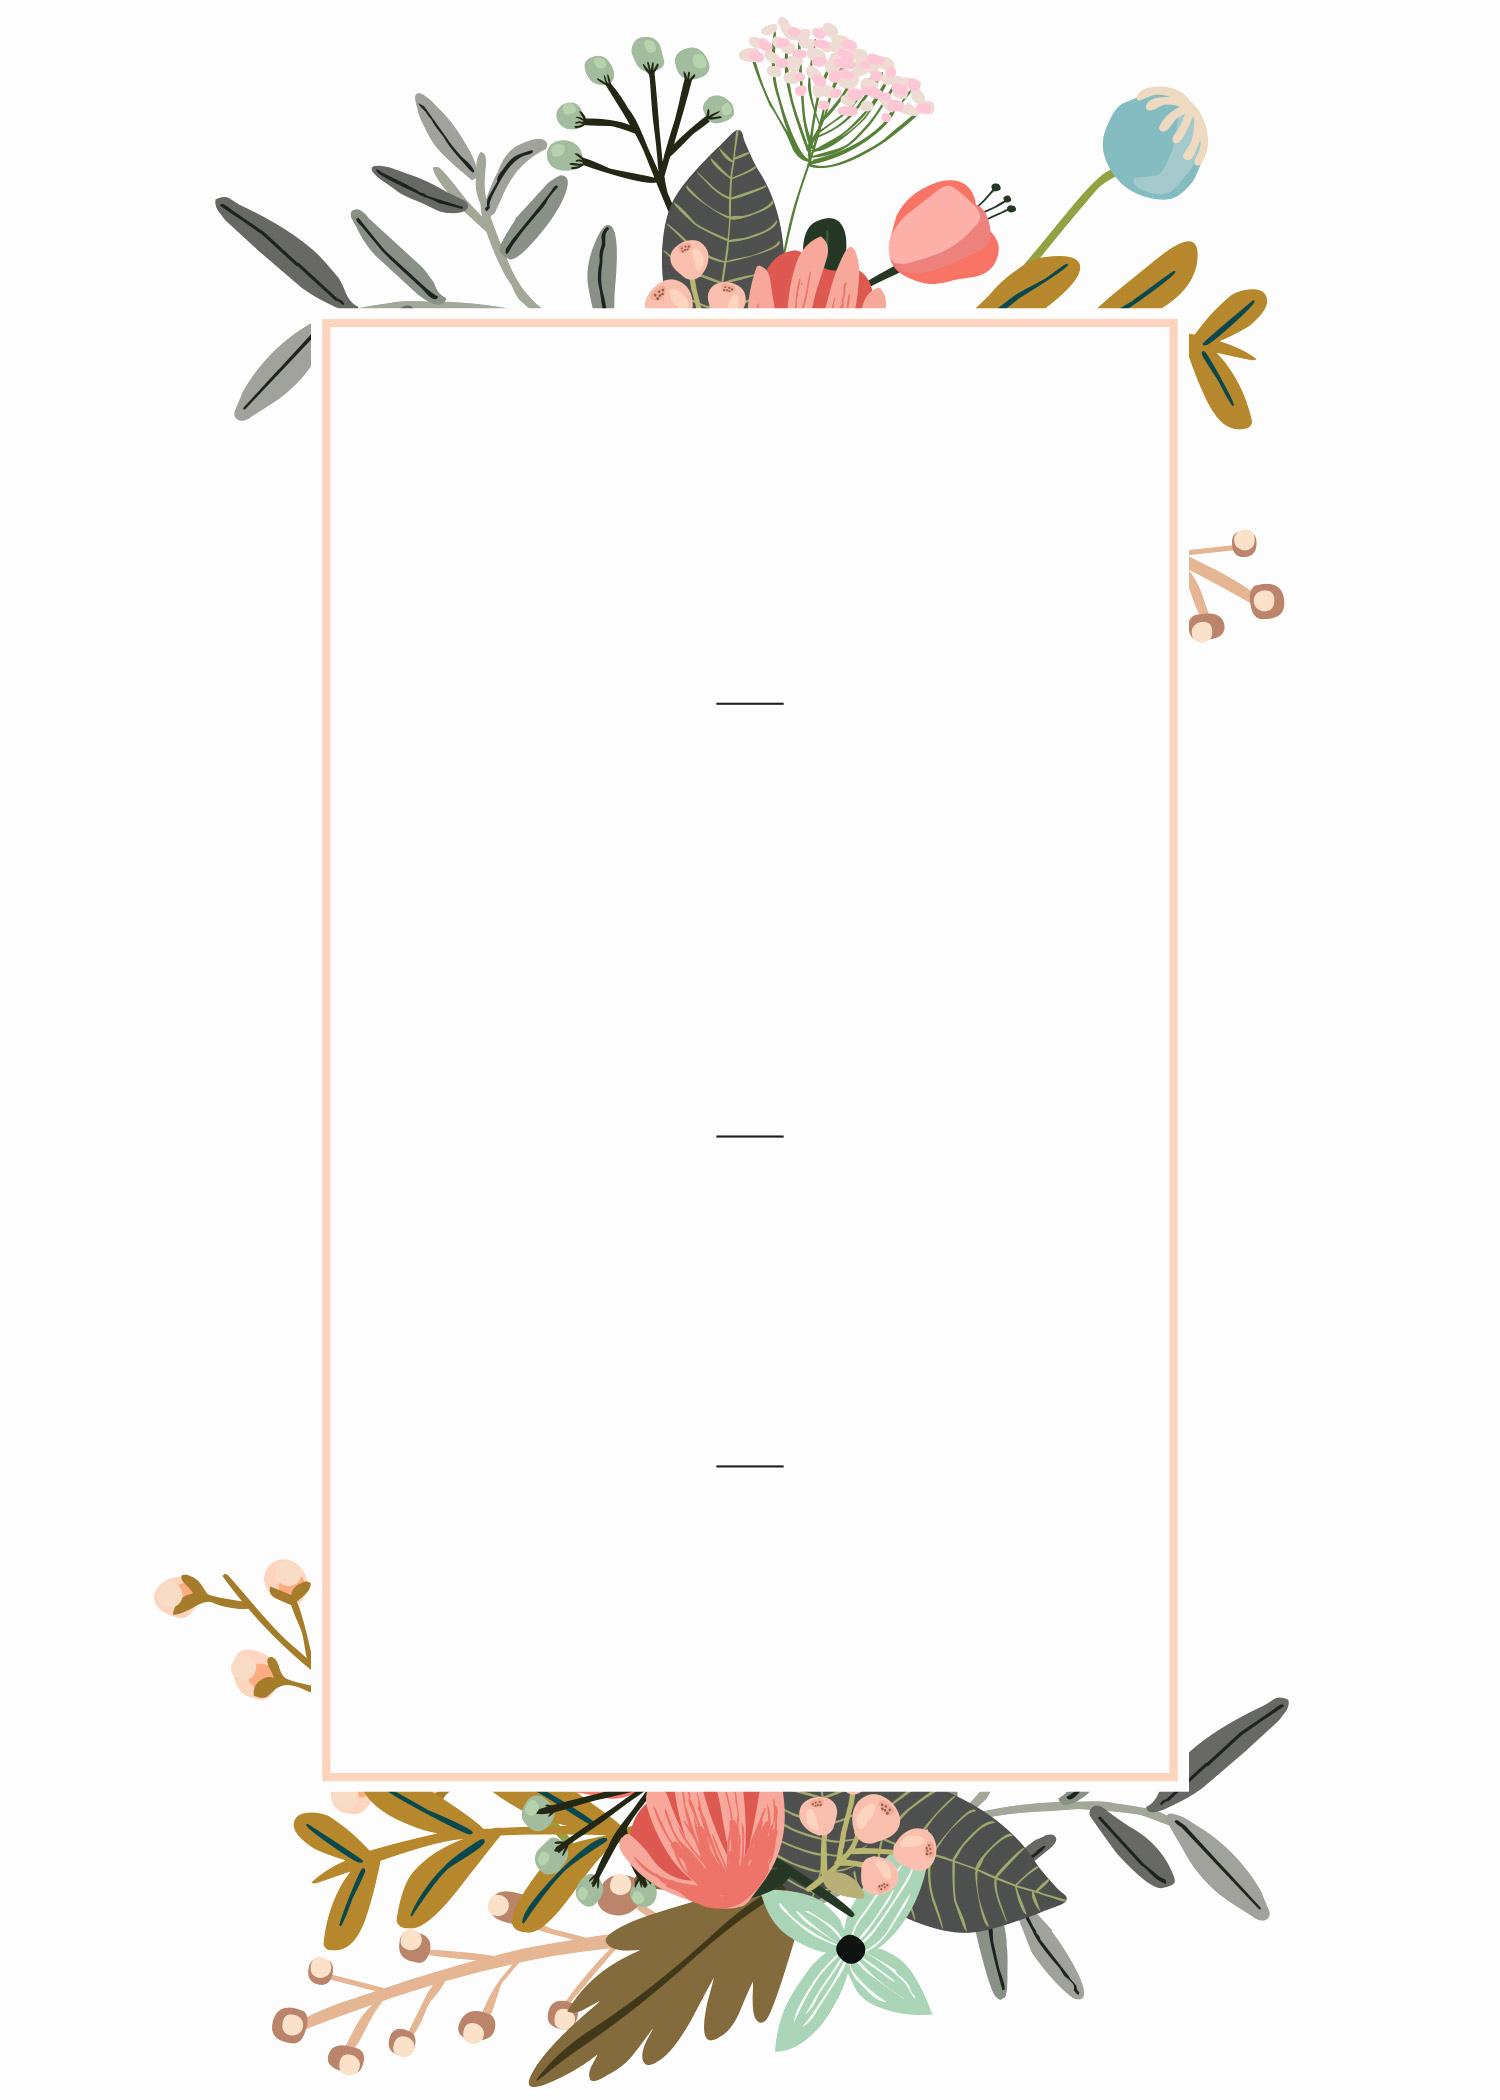 Wedding Invitation Templates Word Fresh Editable Wedding Invitation Templates for the Perfect Card